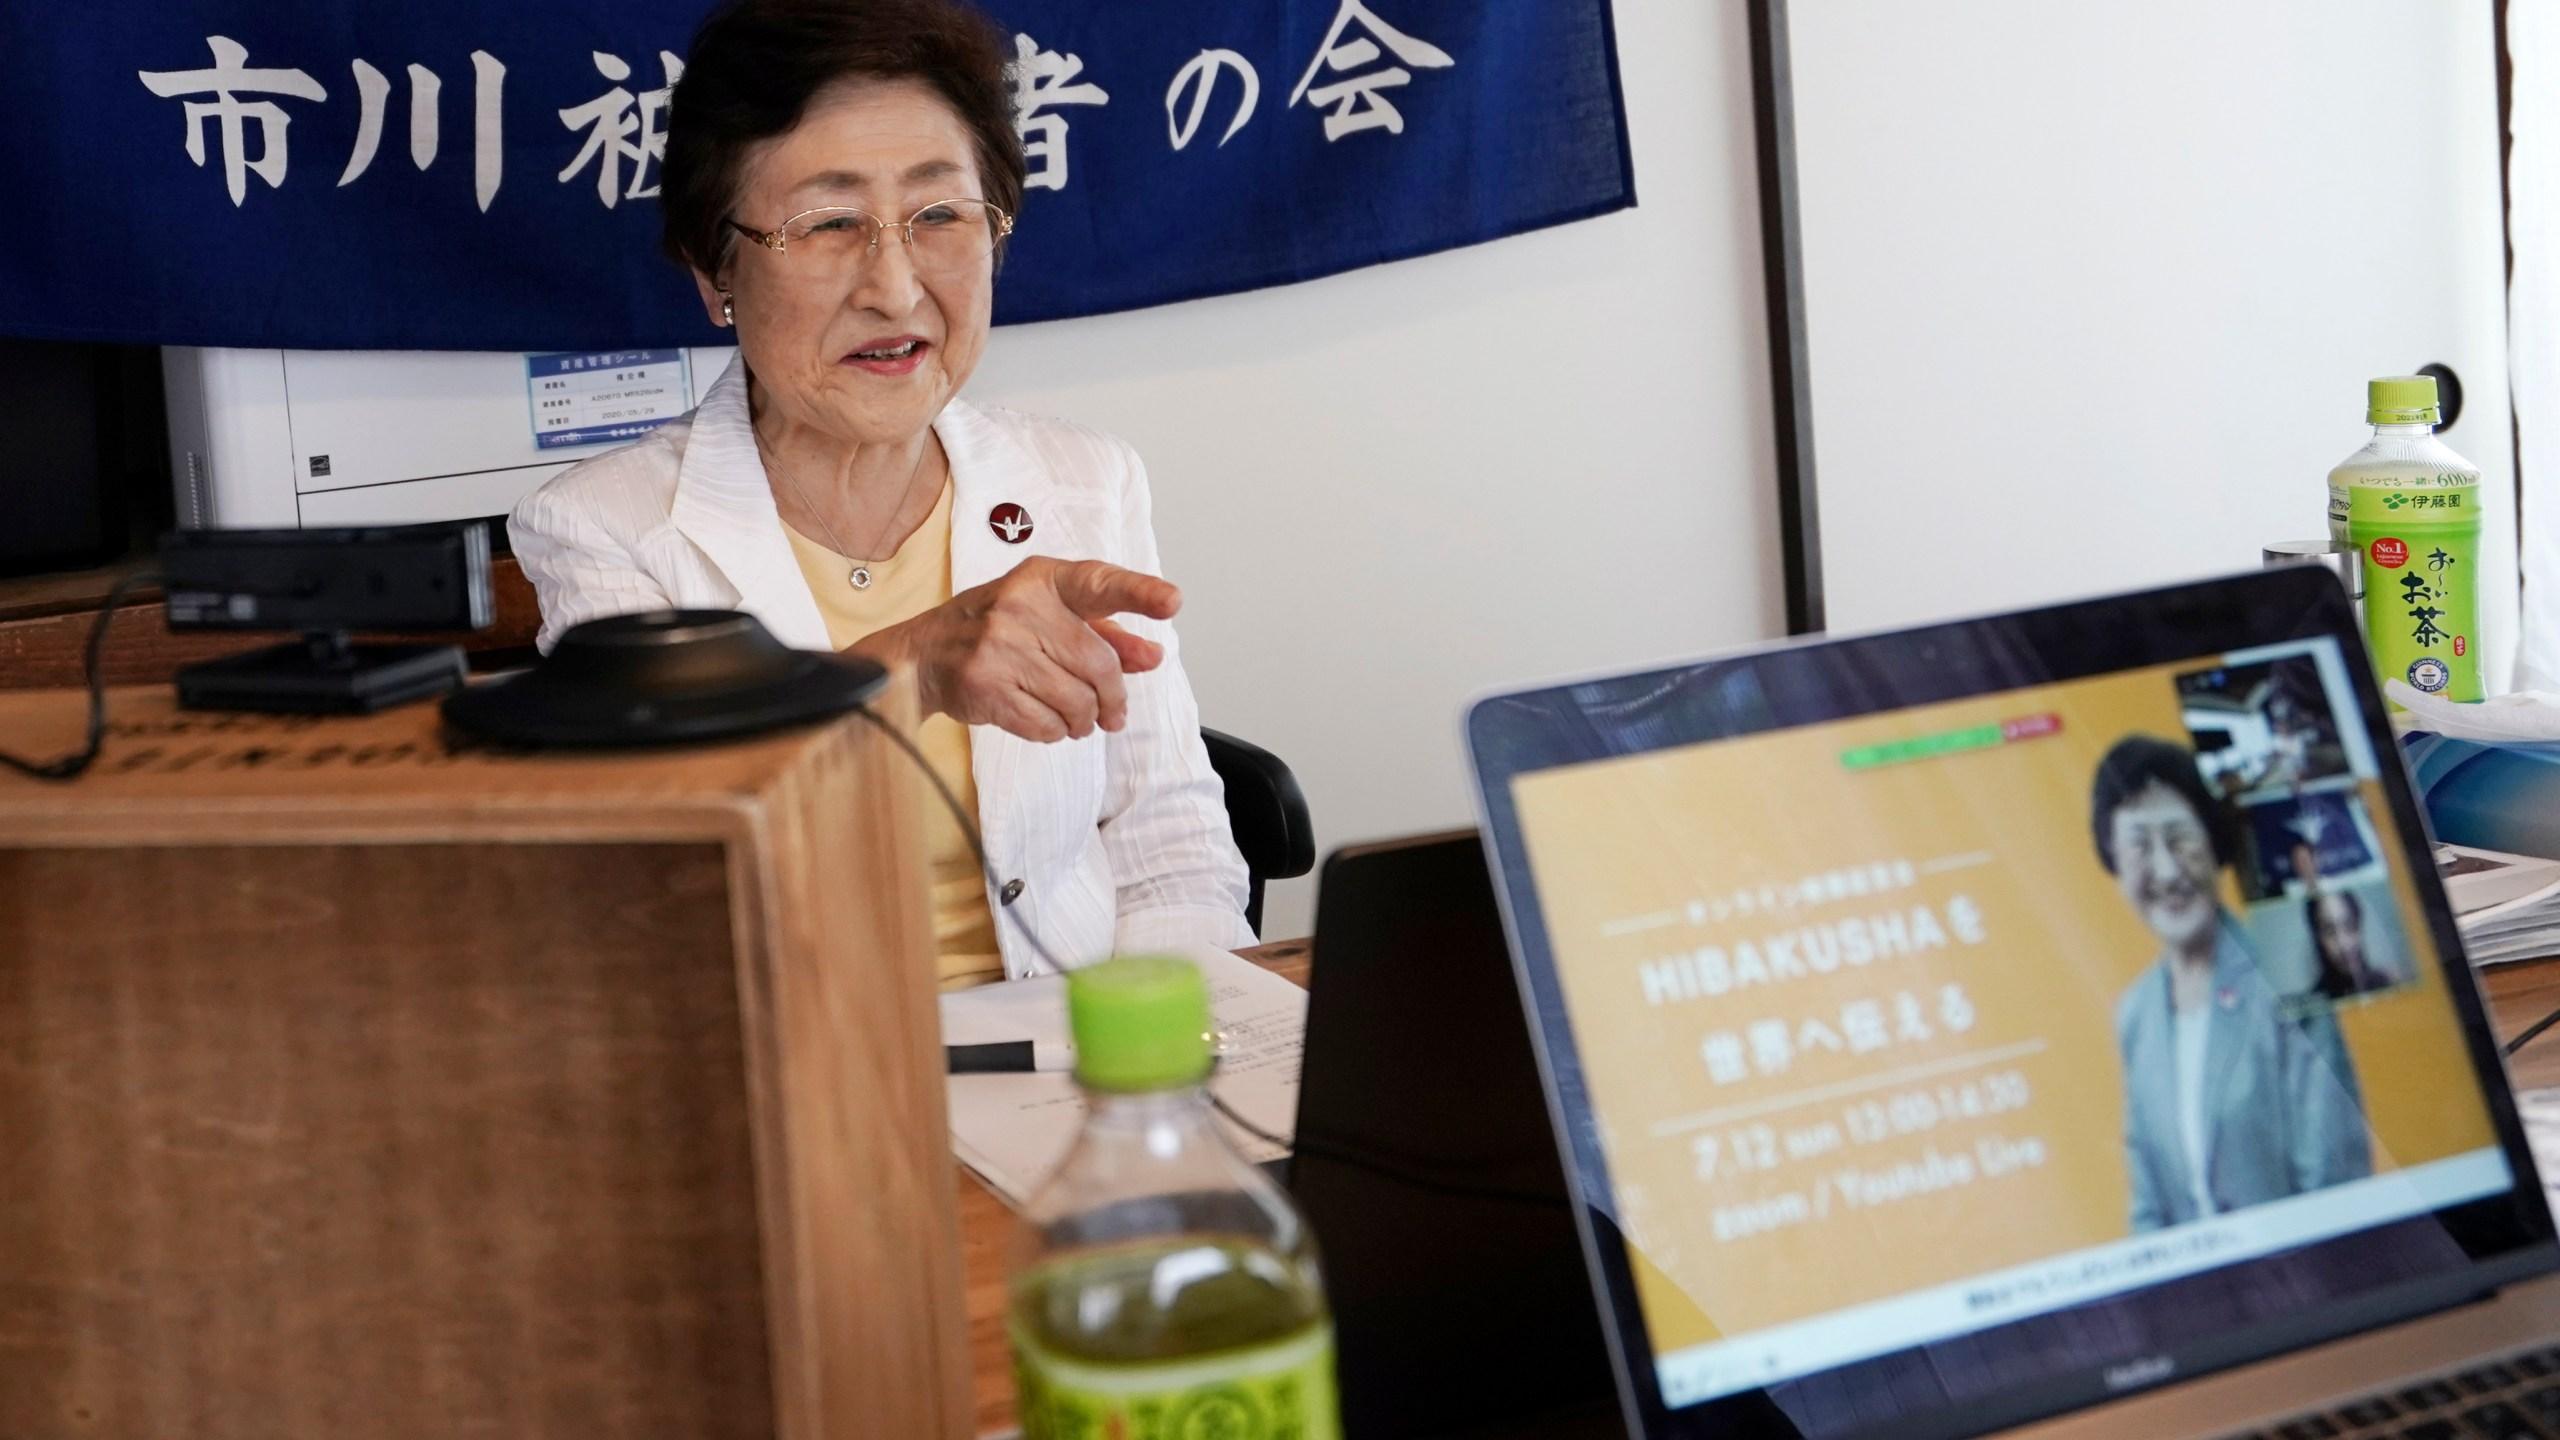 Michiko Kodama